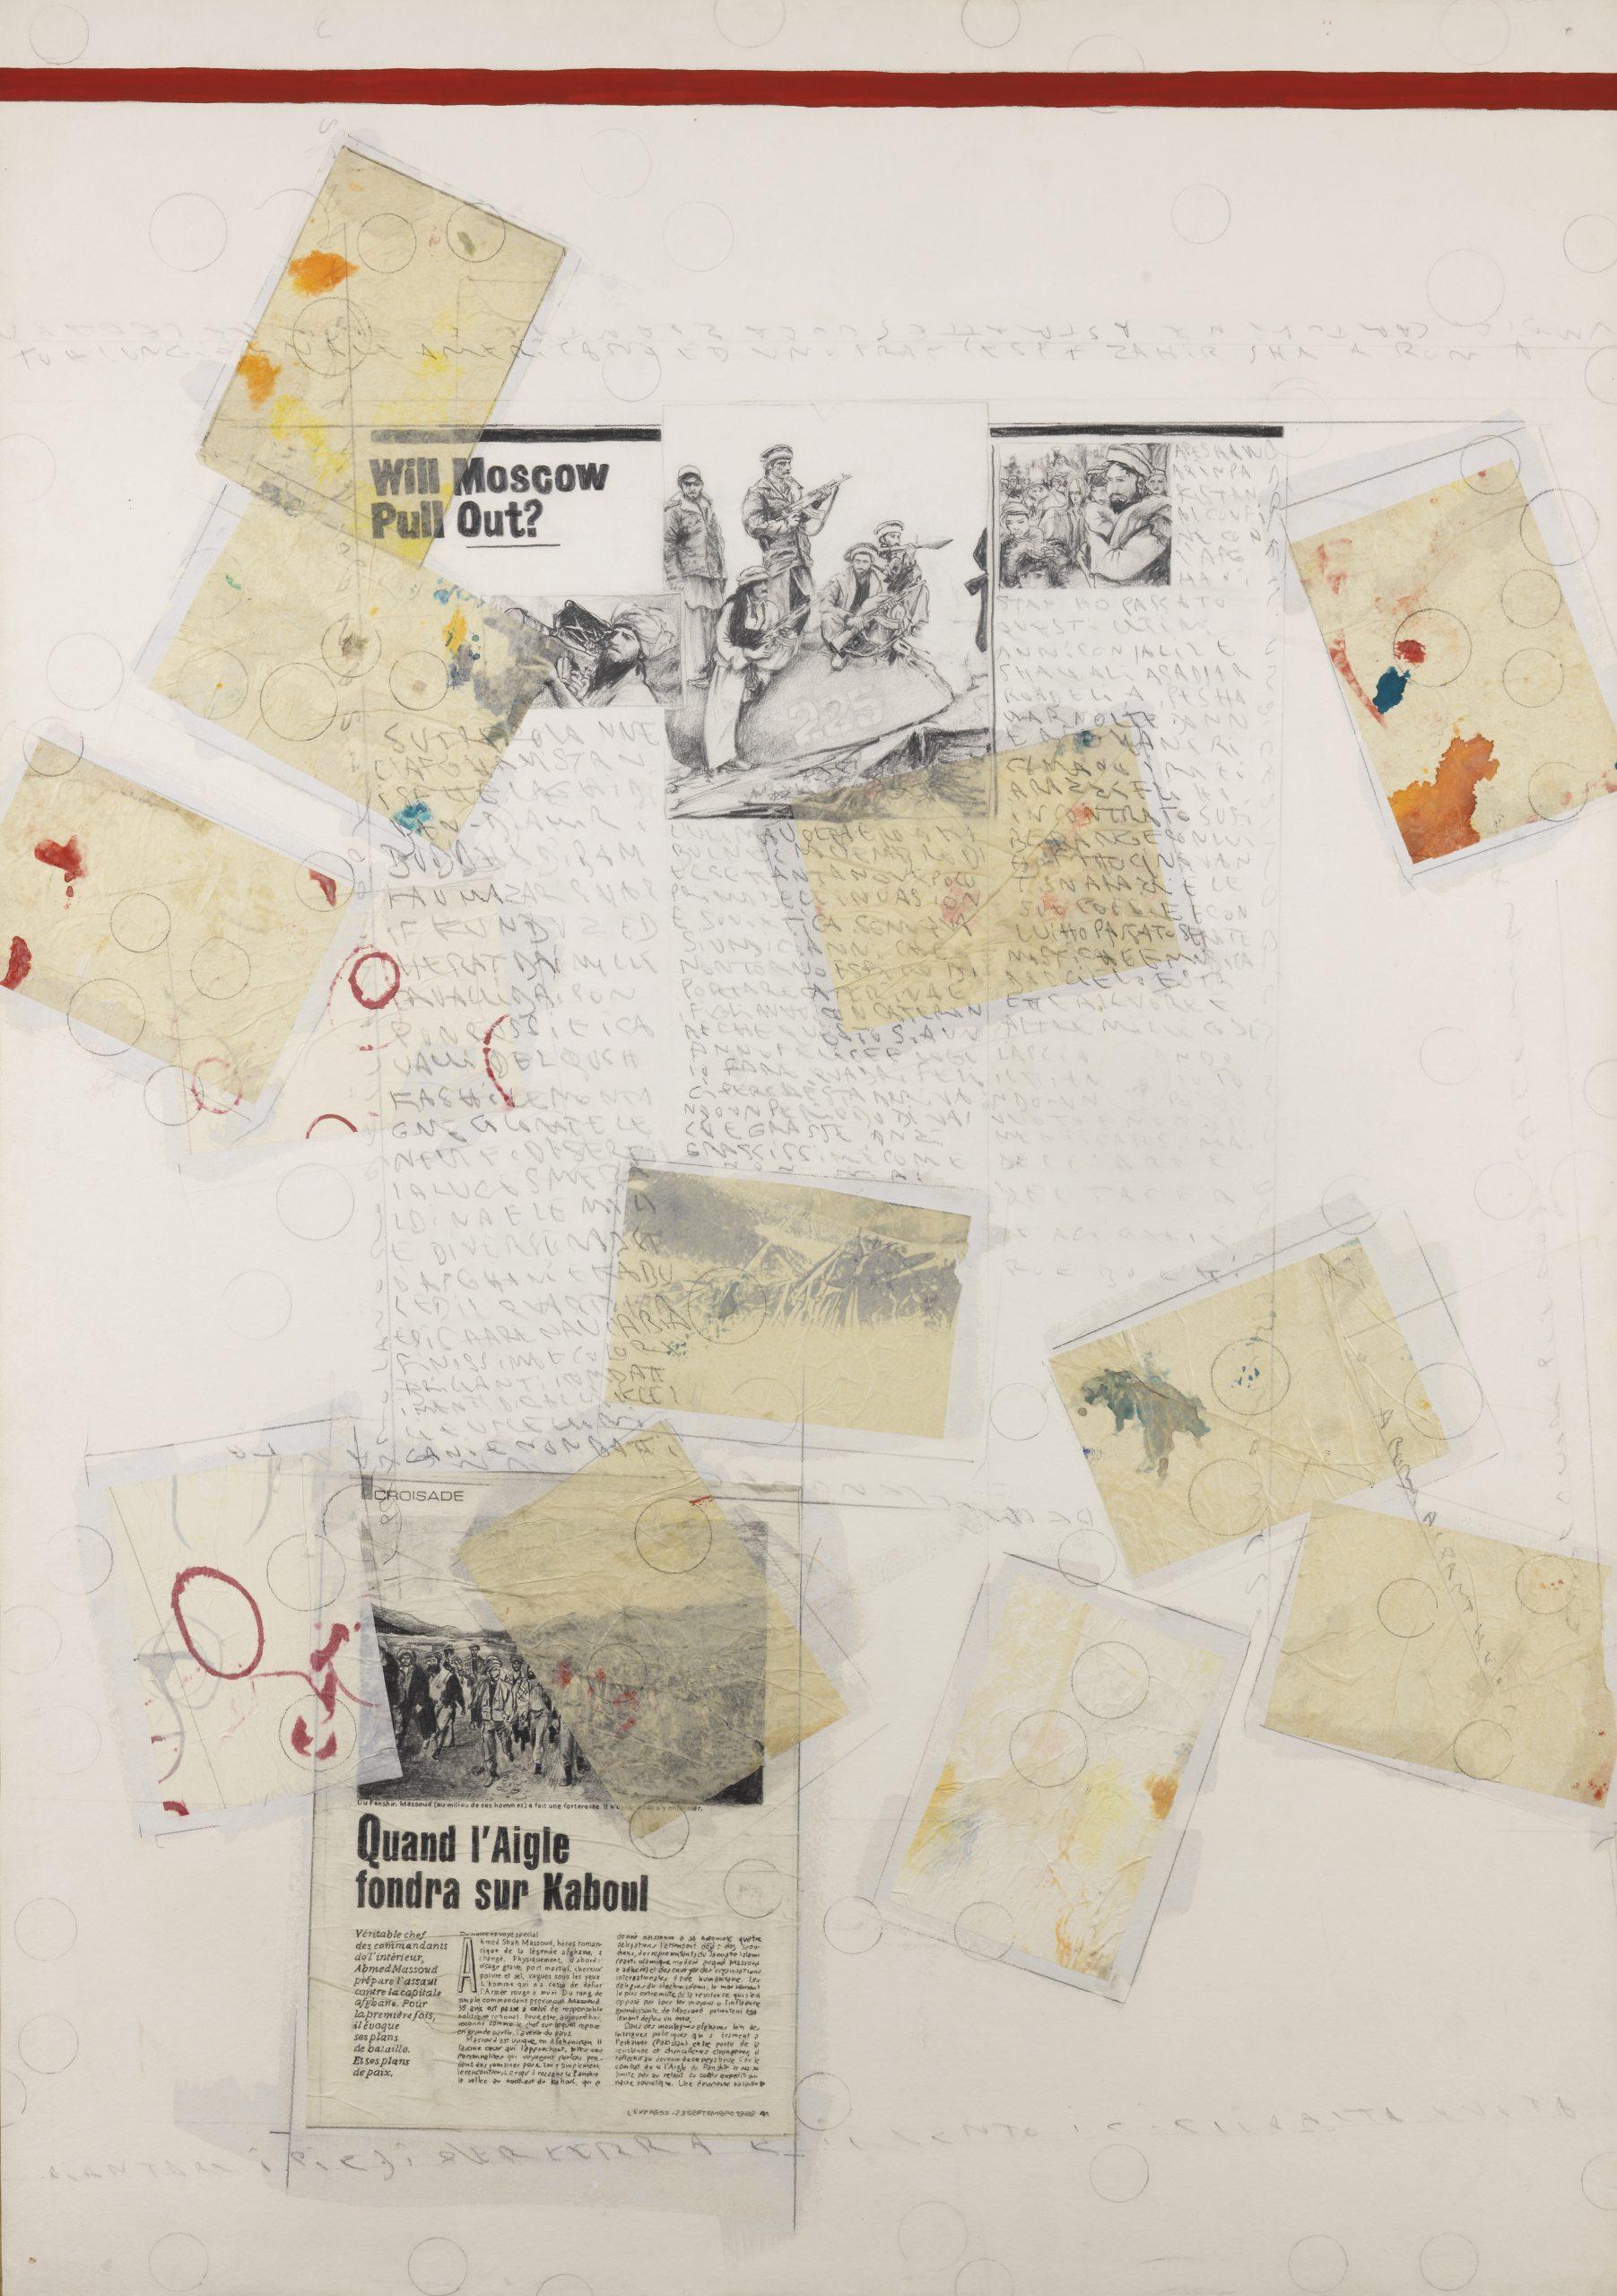 Senza titolo (Primo lavoro dell'anno pensando all'Afghanistan), 1990 mixed media on paper mounted on canvas 39,37 x 27,55 inch - 100 x 70 cm